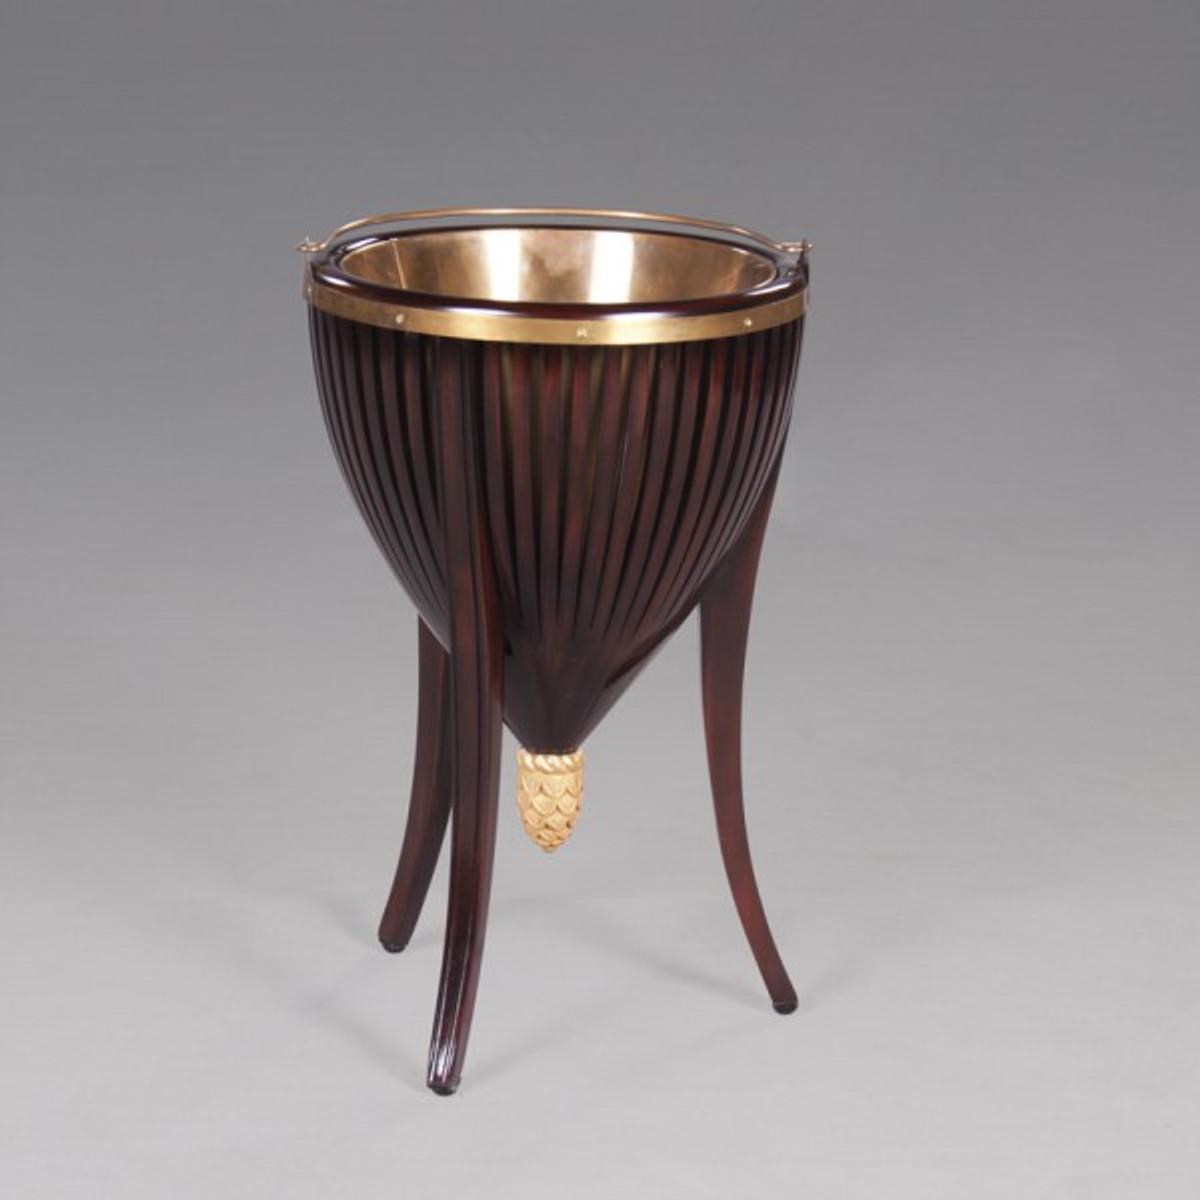 casa padrino luxus weinst nder champagnerst nder. Black Bedroom Furniture Sets. Home Design Ideas